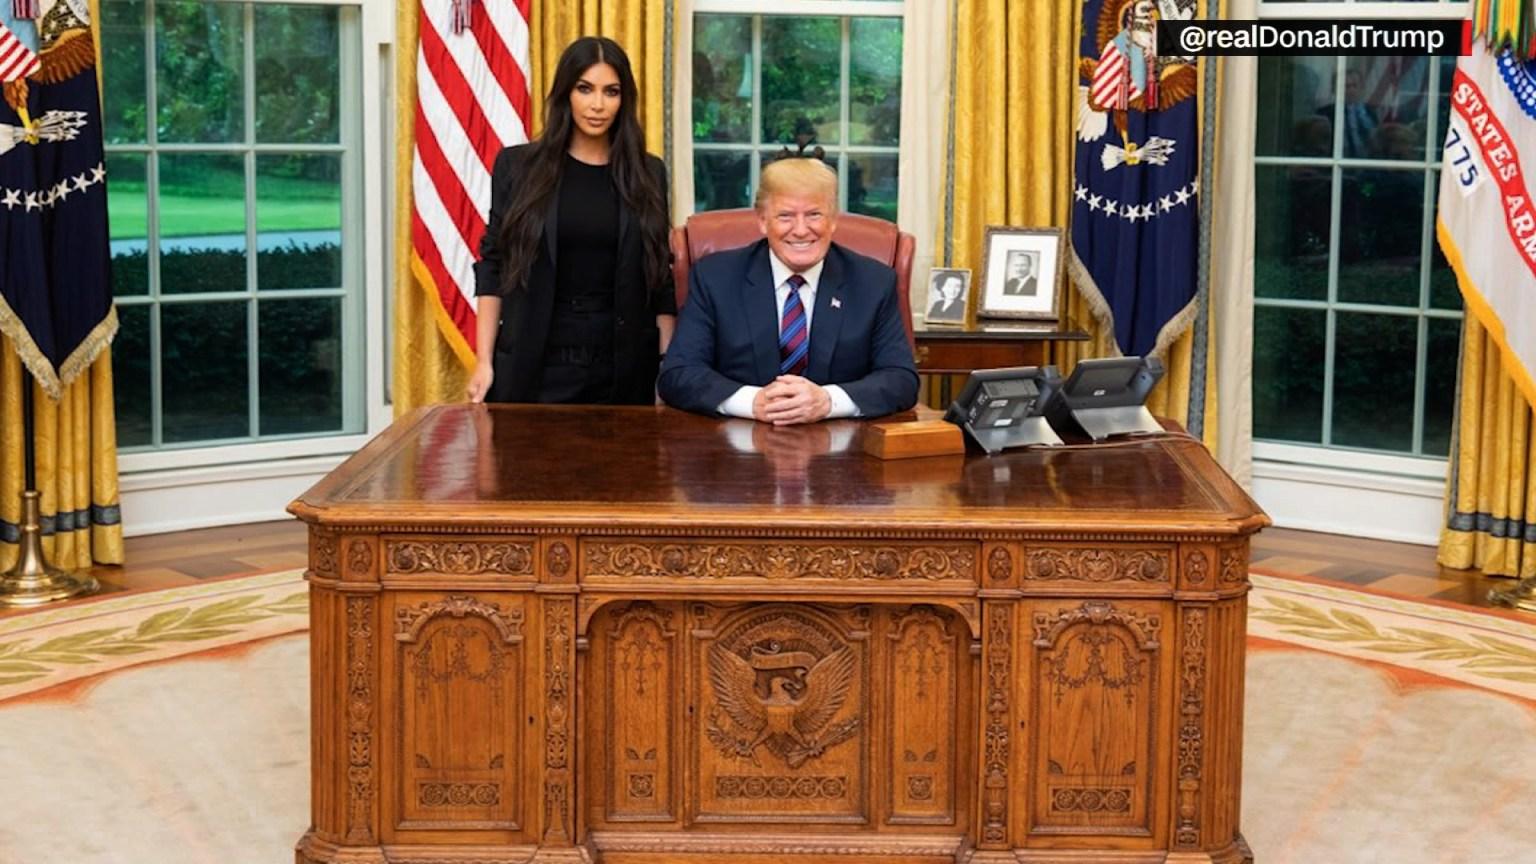 Kim Kardashian West makes another White House visit to talk criminal justice reform